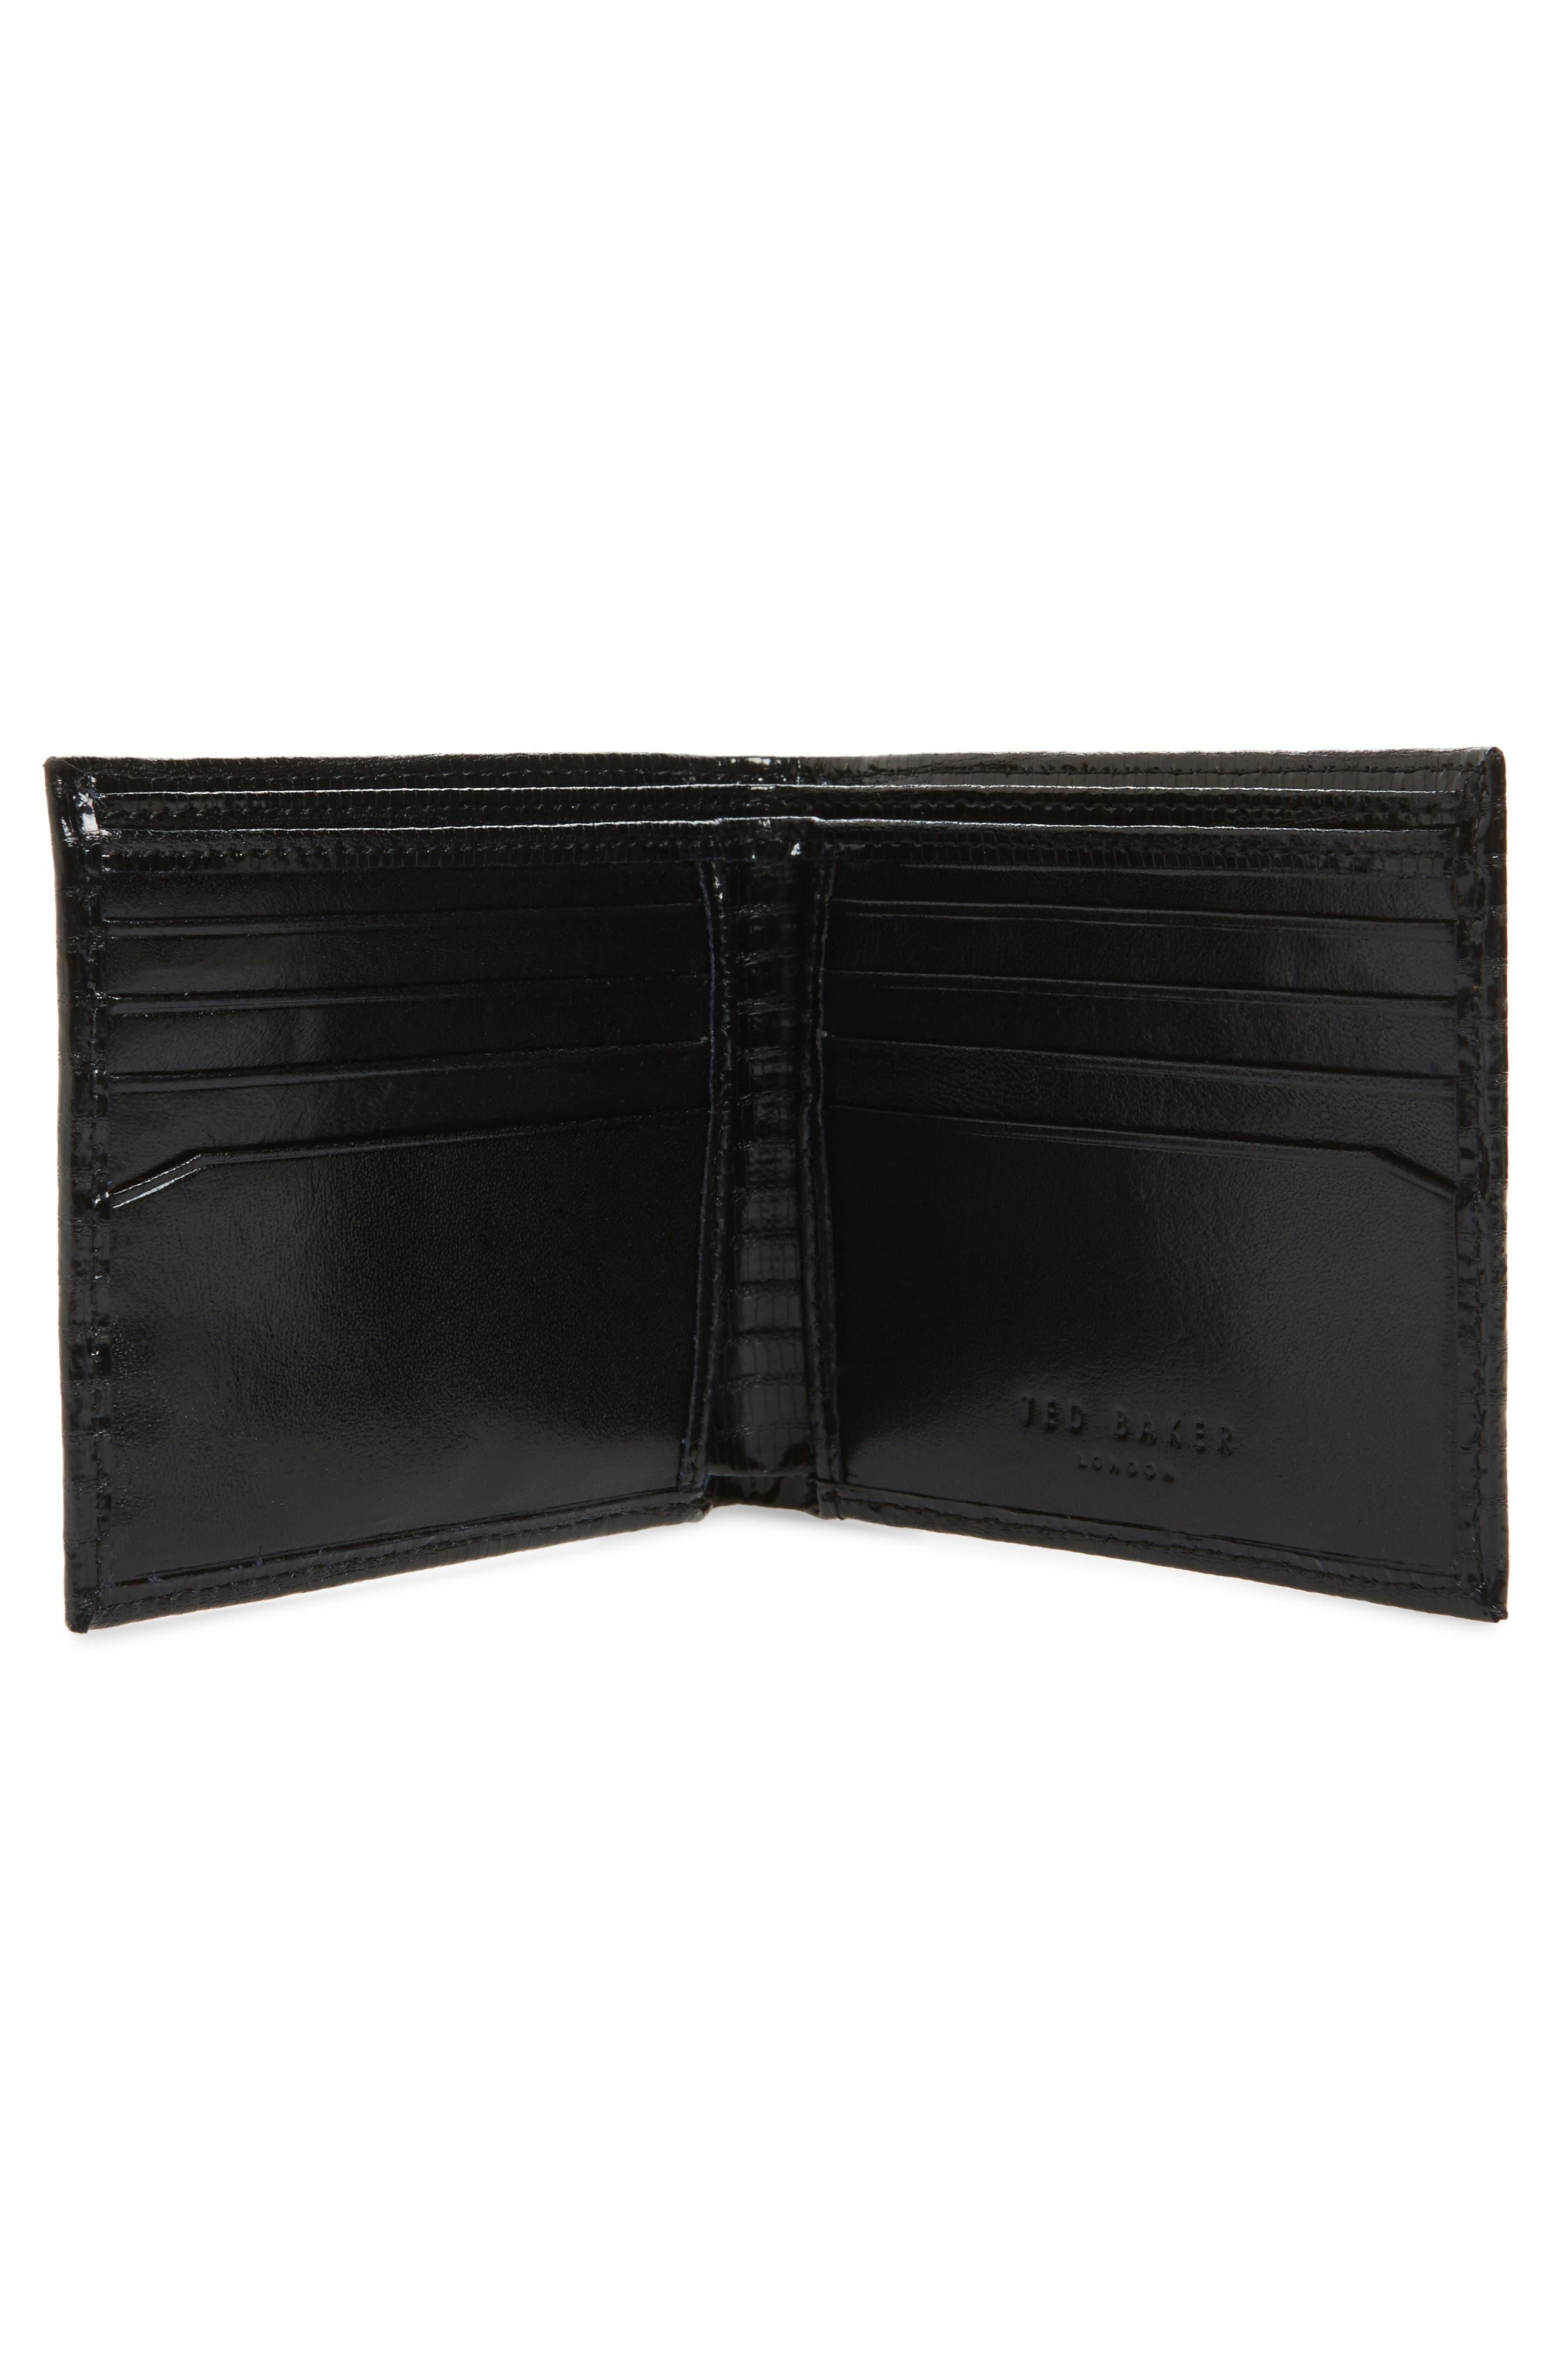 Slayts Leather Wallet,                             Alternate thumbnail 2, color,                             001